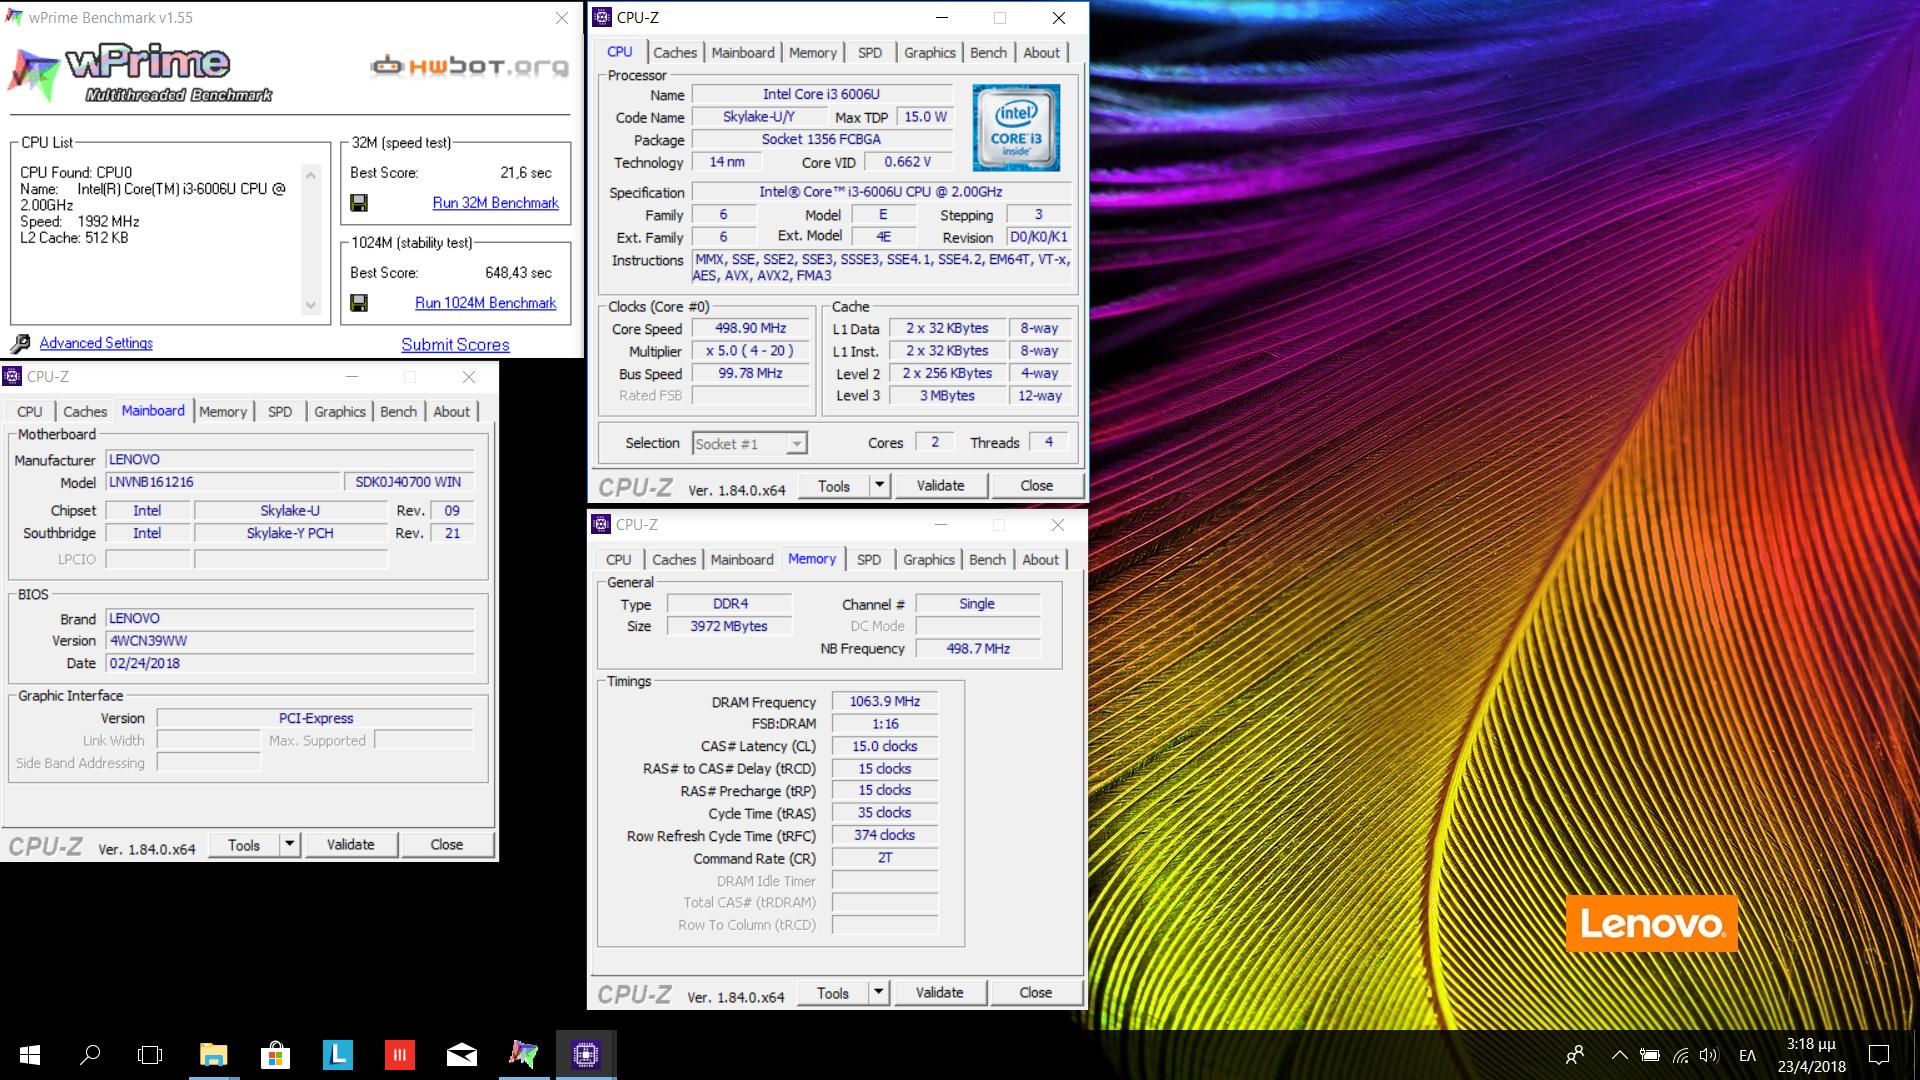 Ilias83`s wPrime - 1024m score: 10min 48sec 430ms with a Core i3 6006U